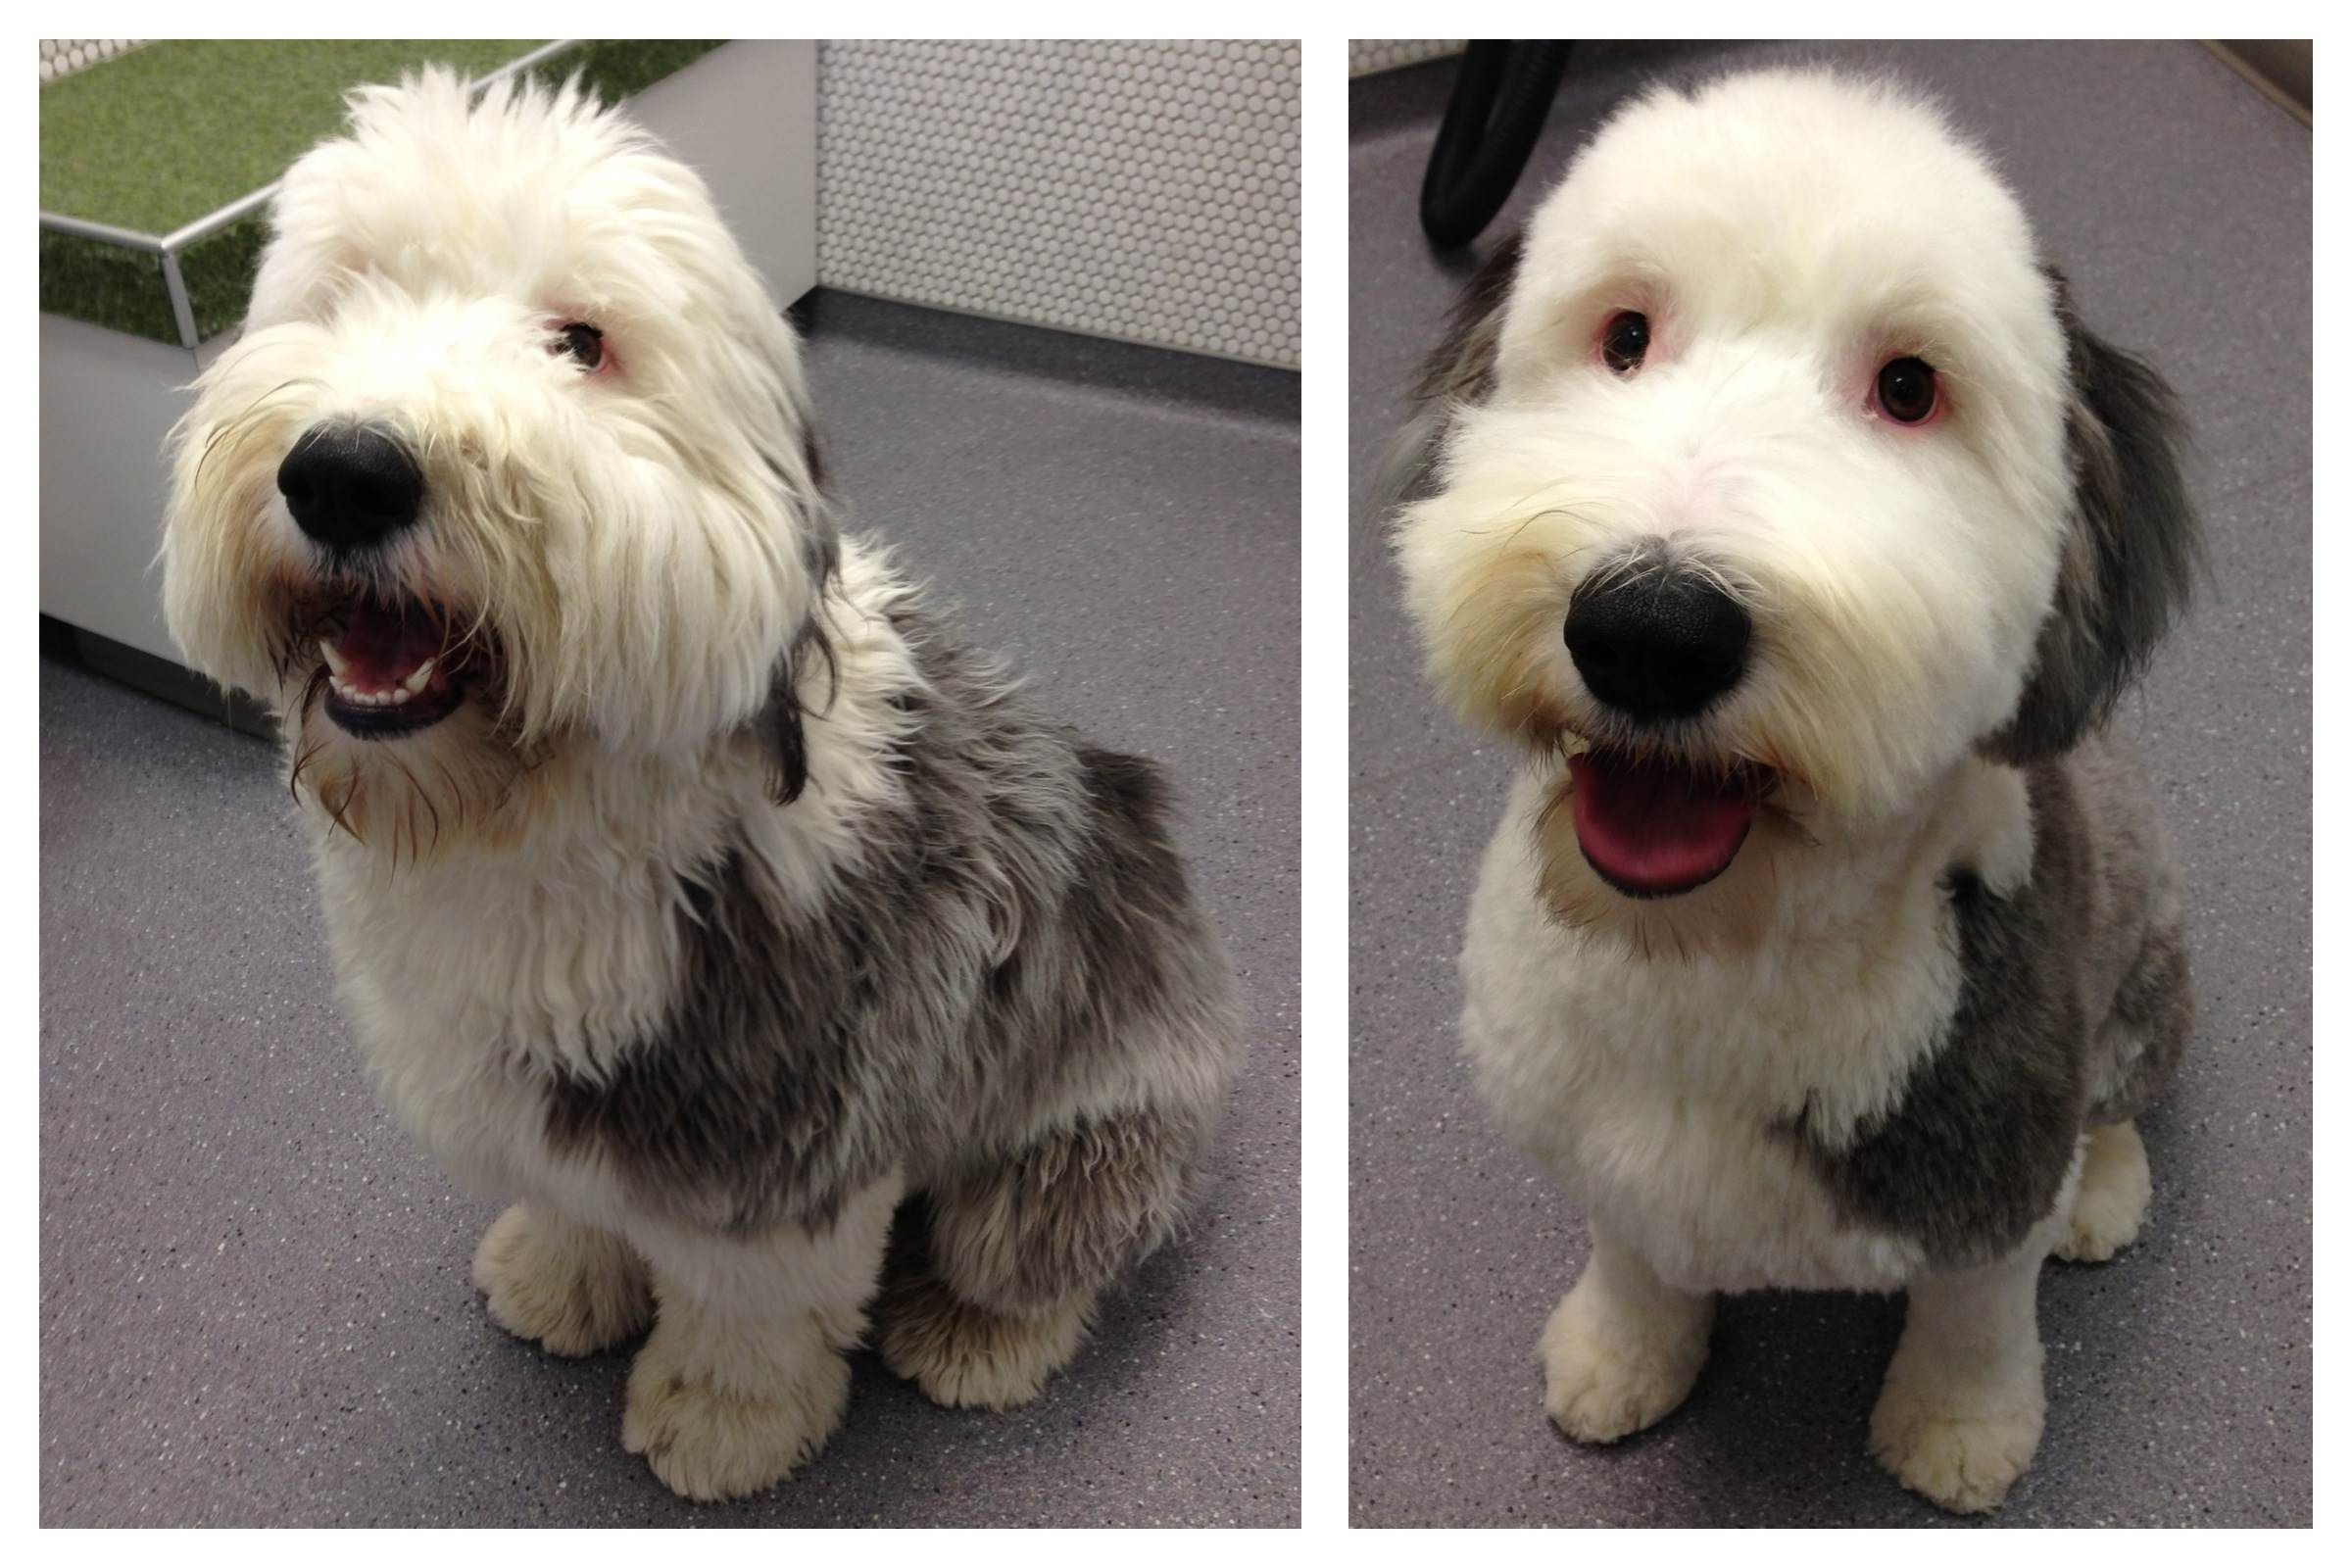 Shaved Wheaten Terrier How Long Until Hair Grows Back Google Search Wheaten Terrier Grow Hair Terrier